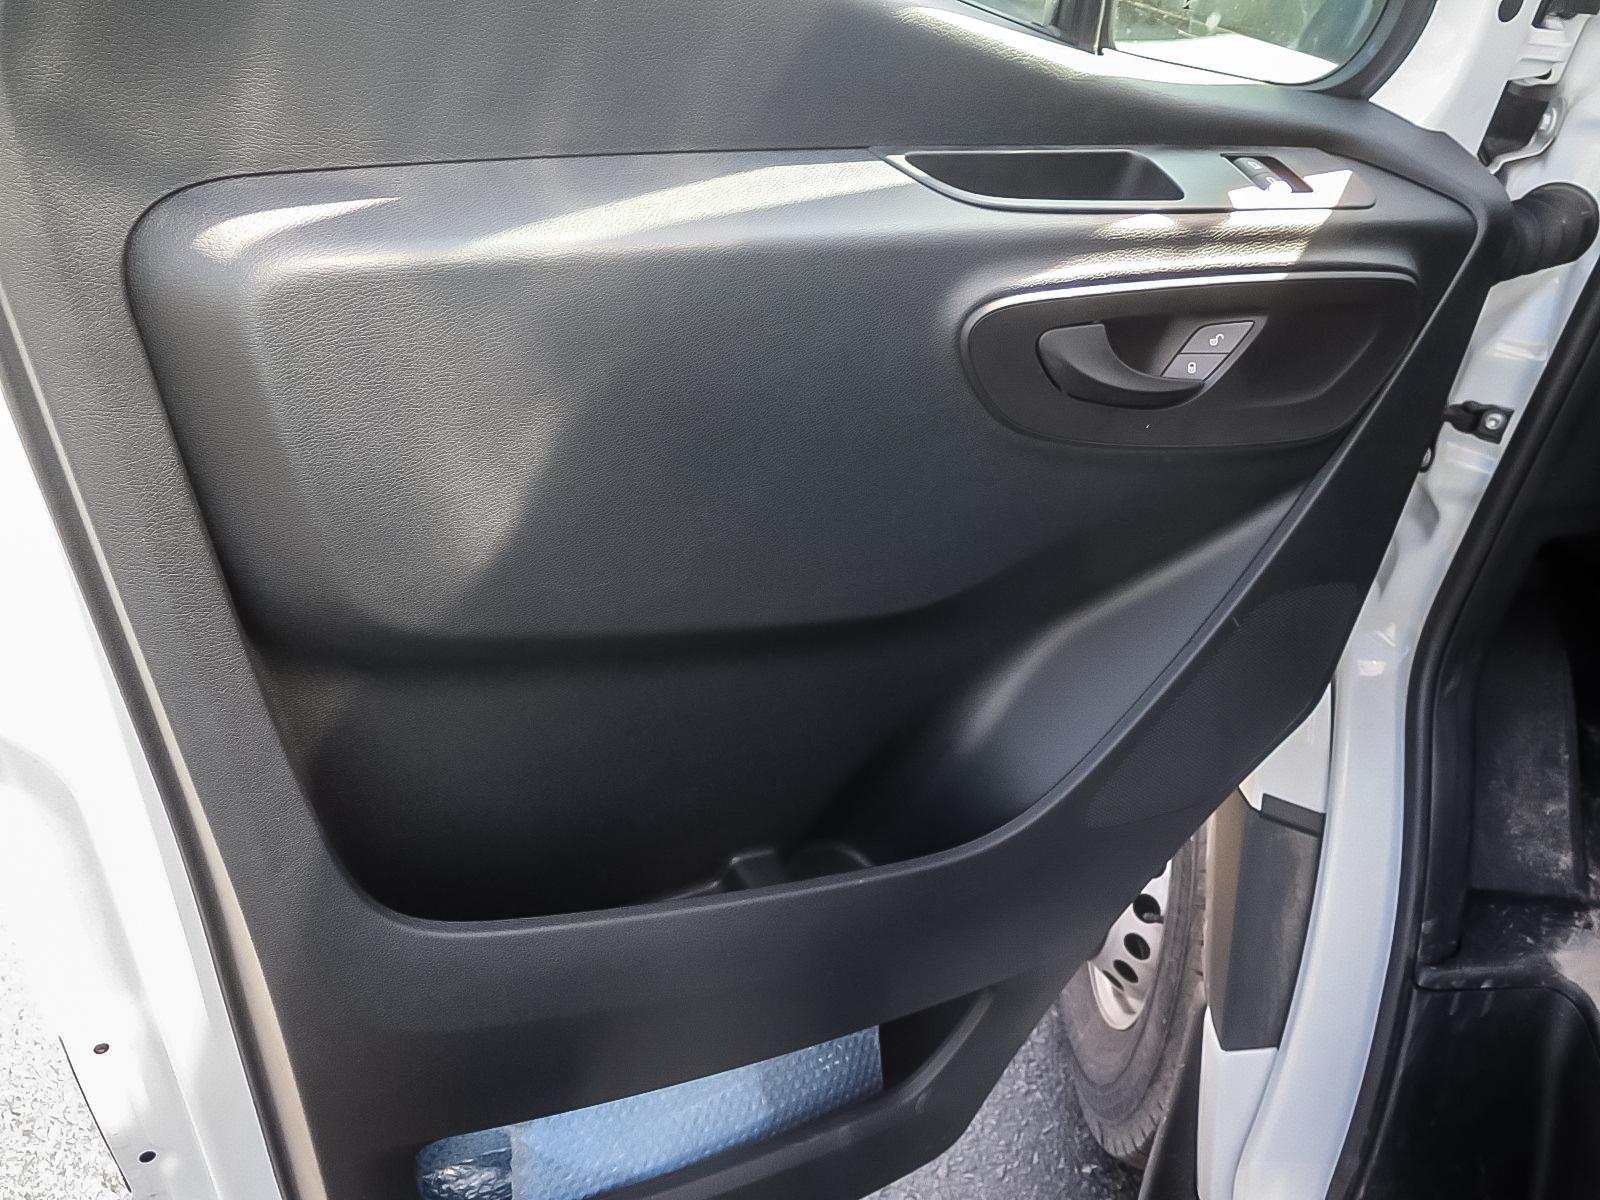 New 2019 Mercedes-Benz Sprinter V6 3500XD Chassis 170